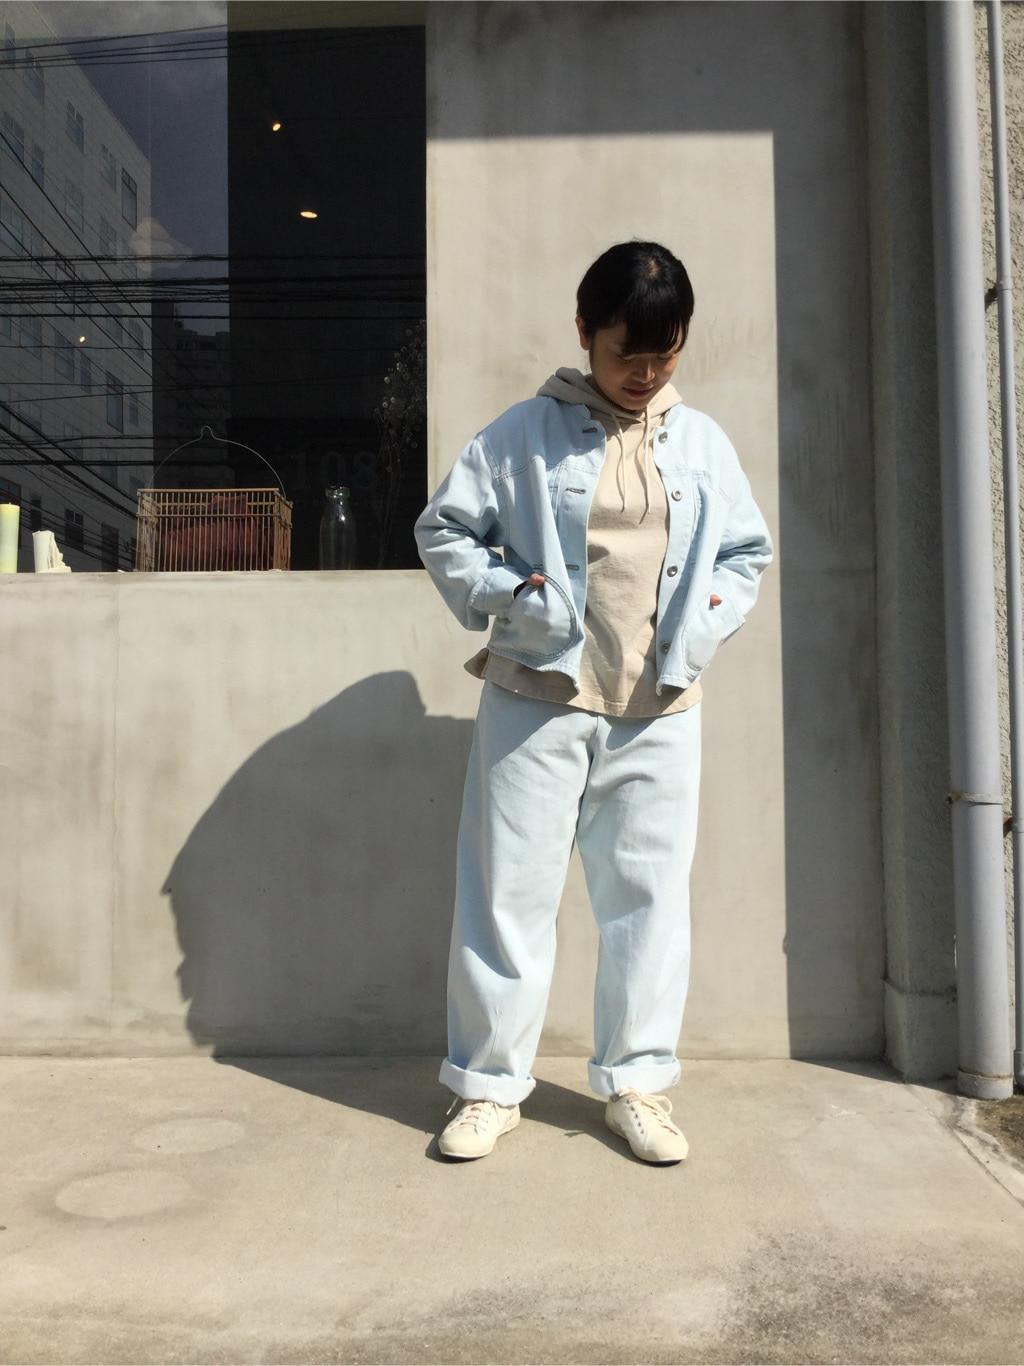 l'atelier du savon 広島パルコ 身長:150cm 2020.02.15